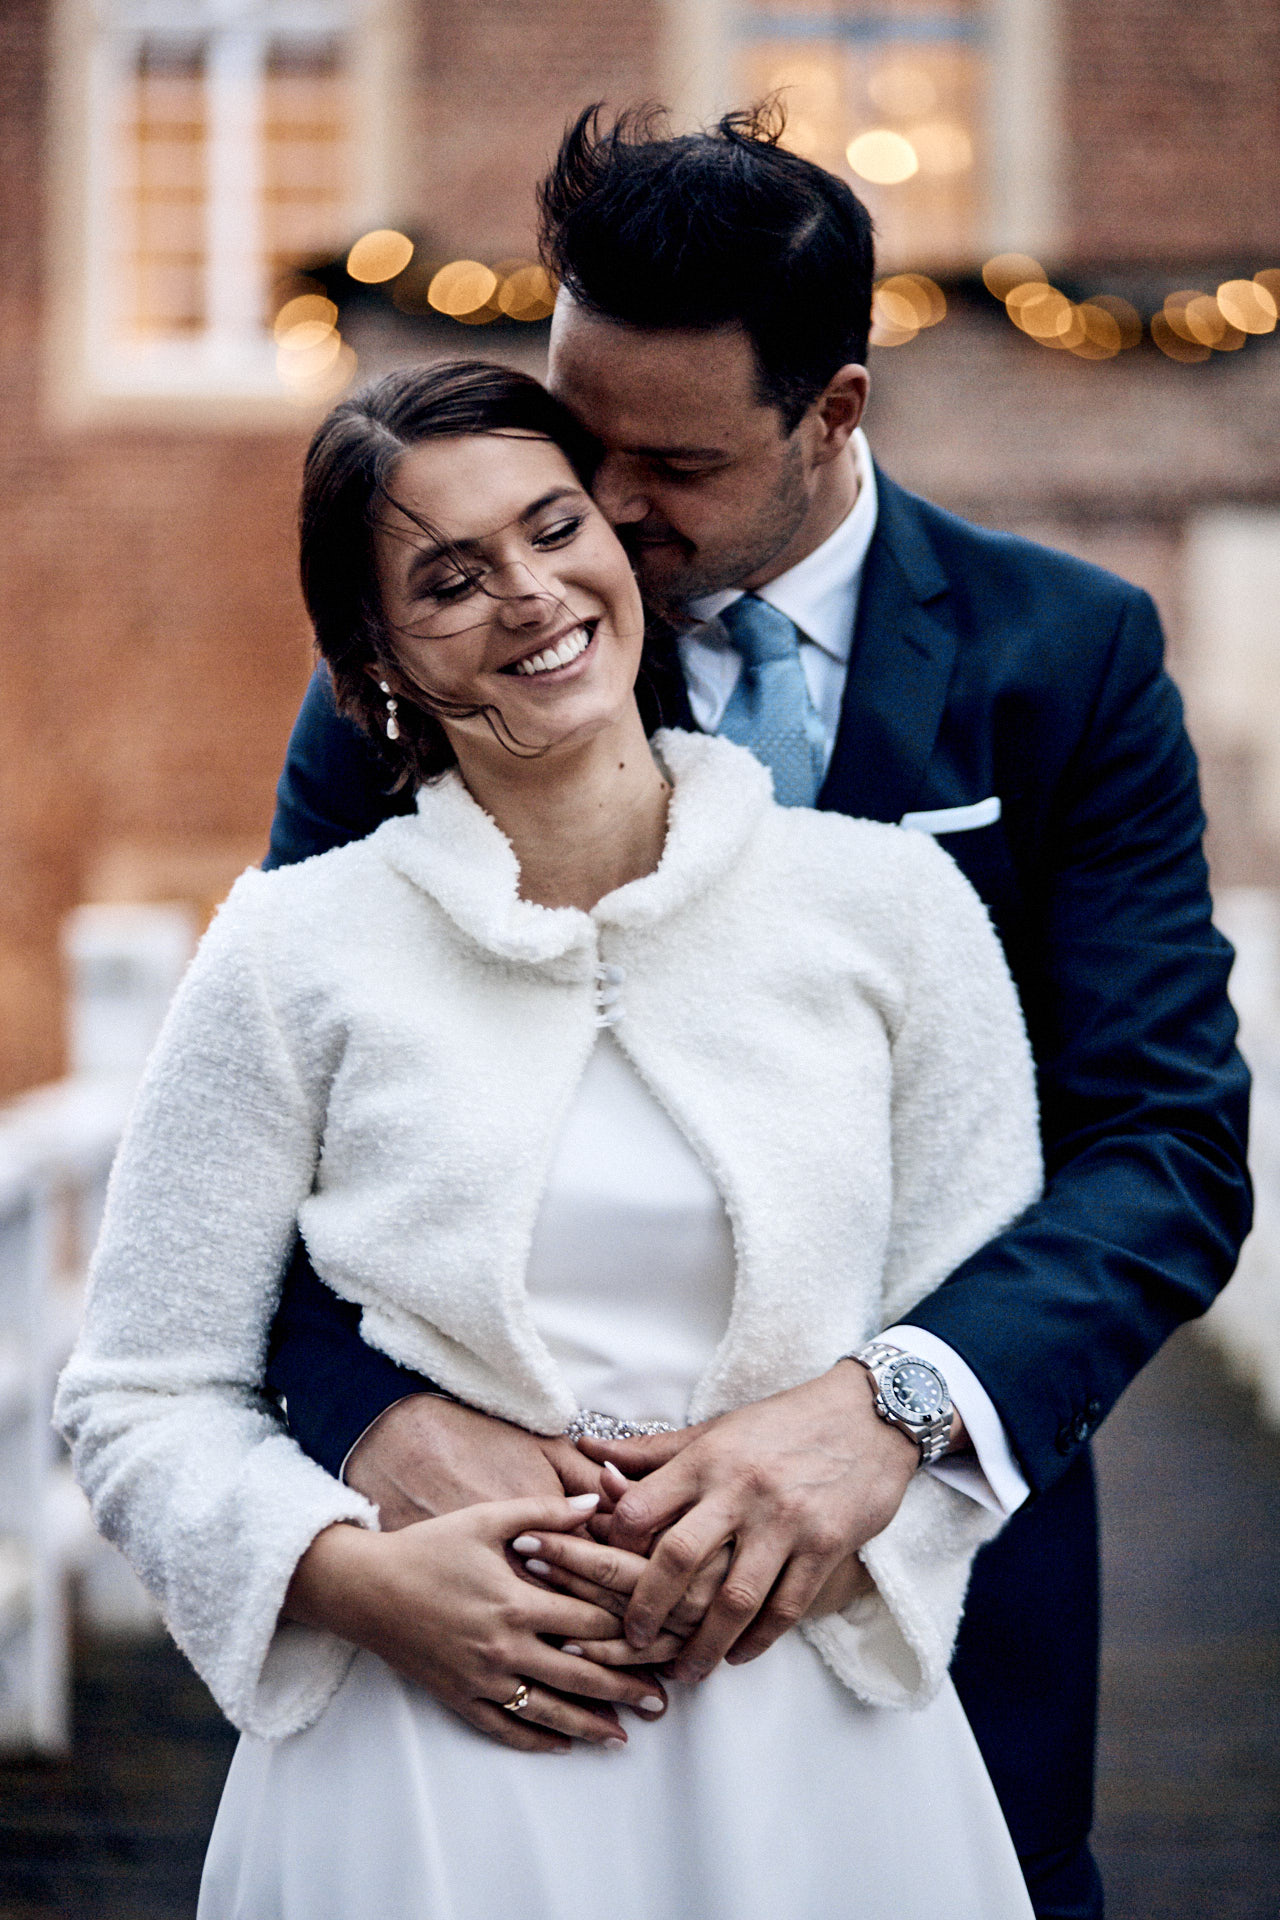 2019-12-20 Laura & Robin - Alena and Daniel Weddings 0562